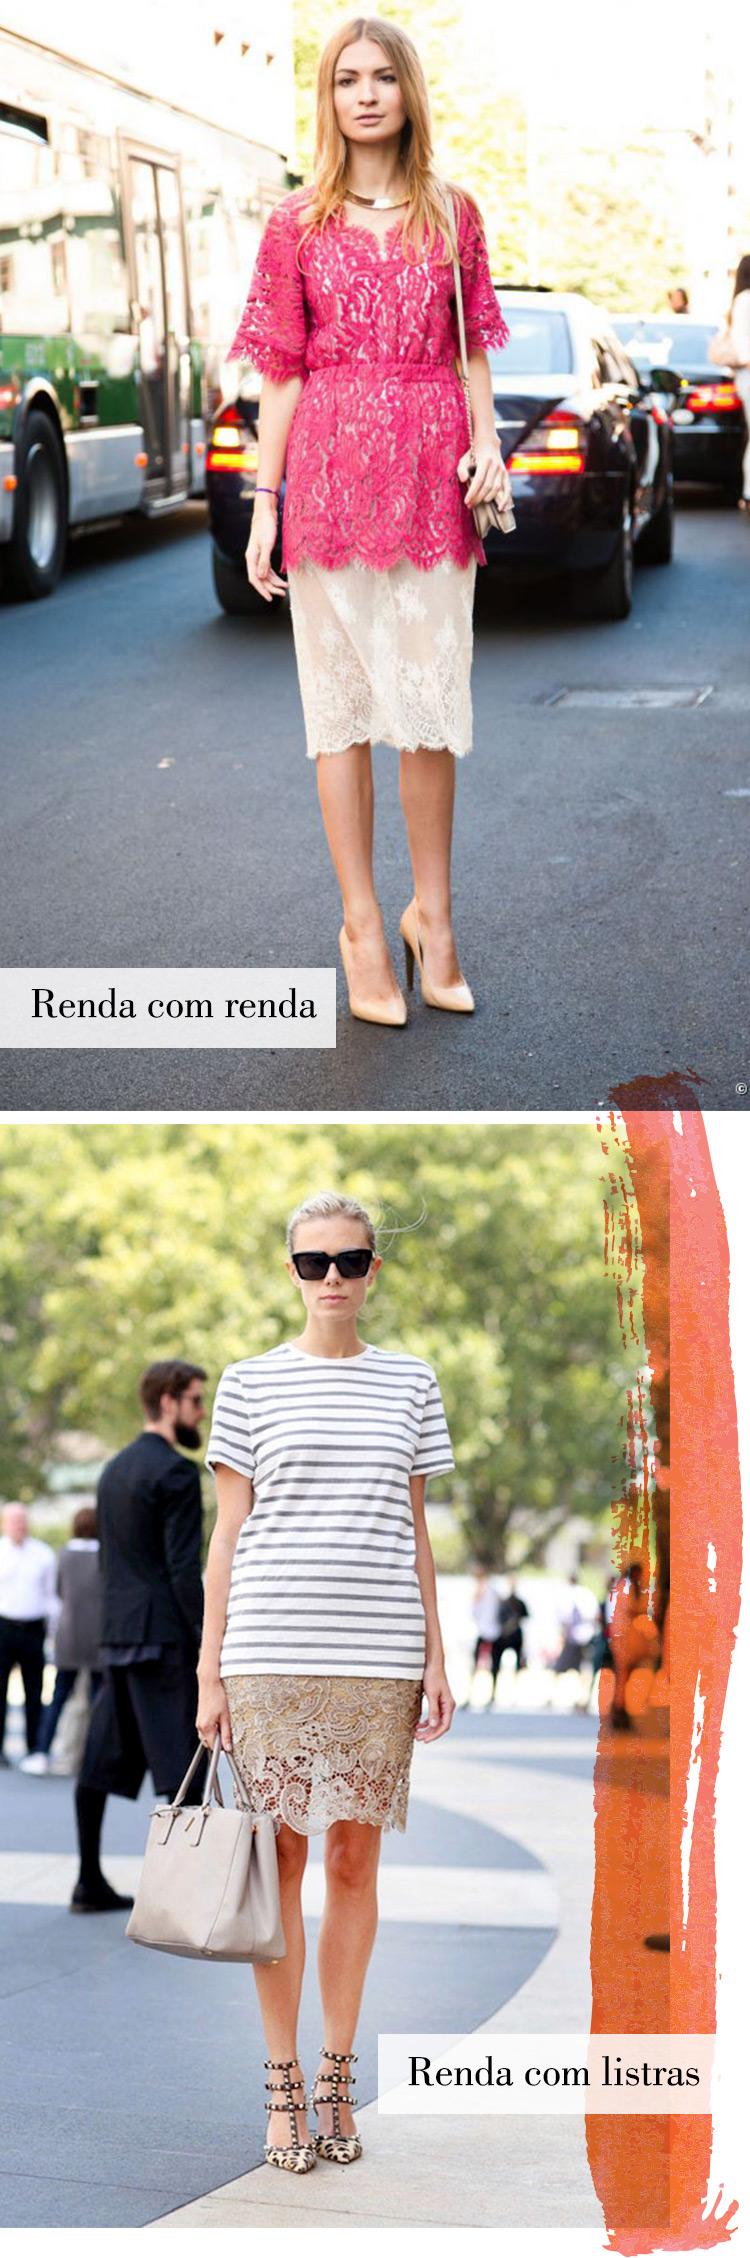 Post_rendas_01.jpg